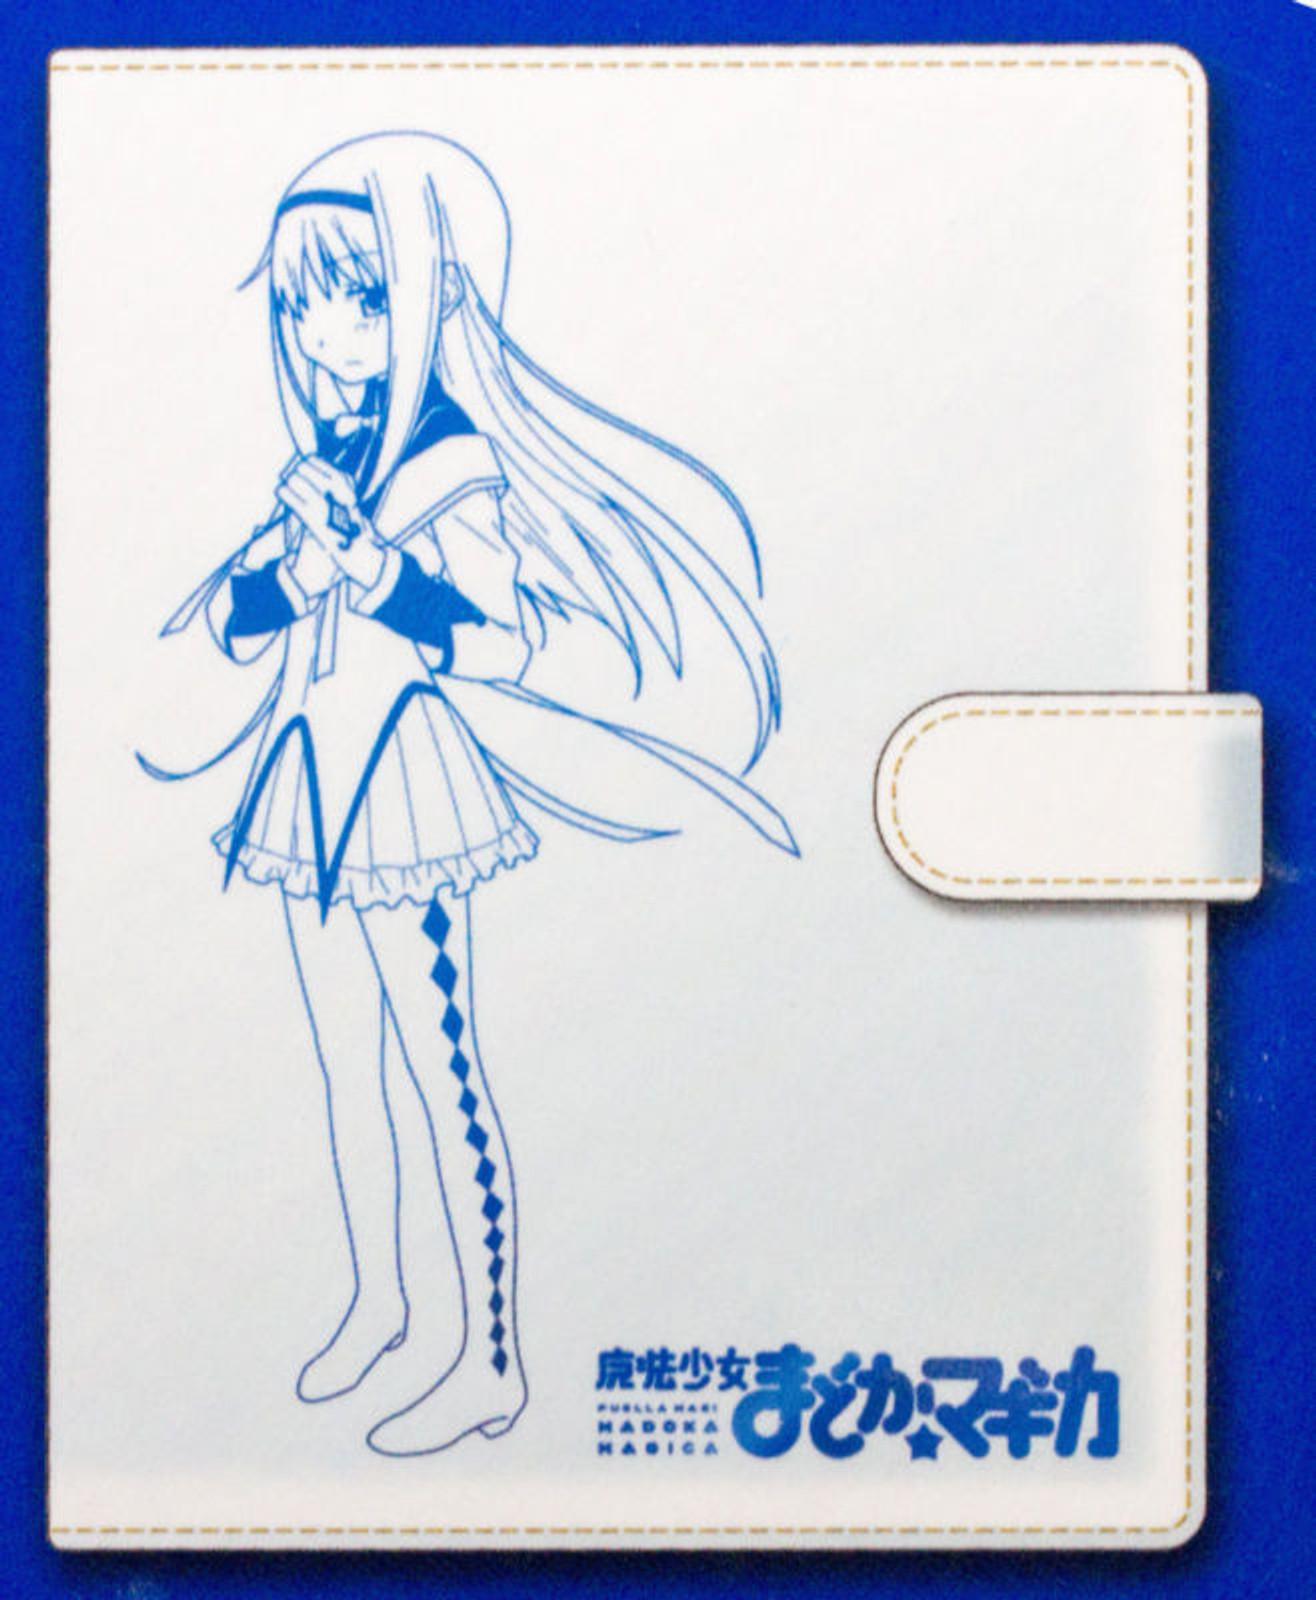 Puella Magi Madoka Magica Personal Organizer Notebook Homura Ver. JAPAN ANIME